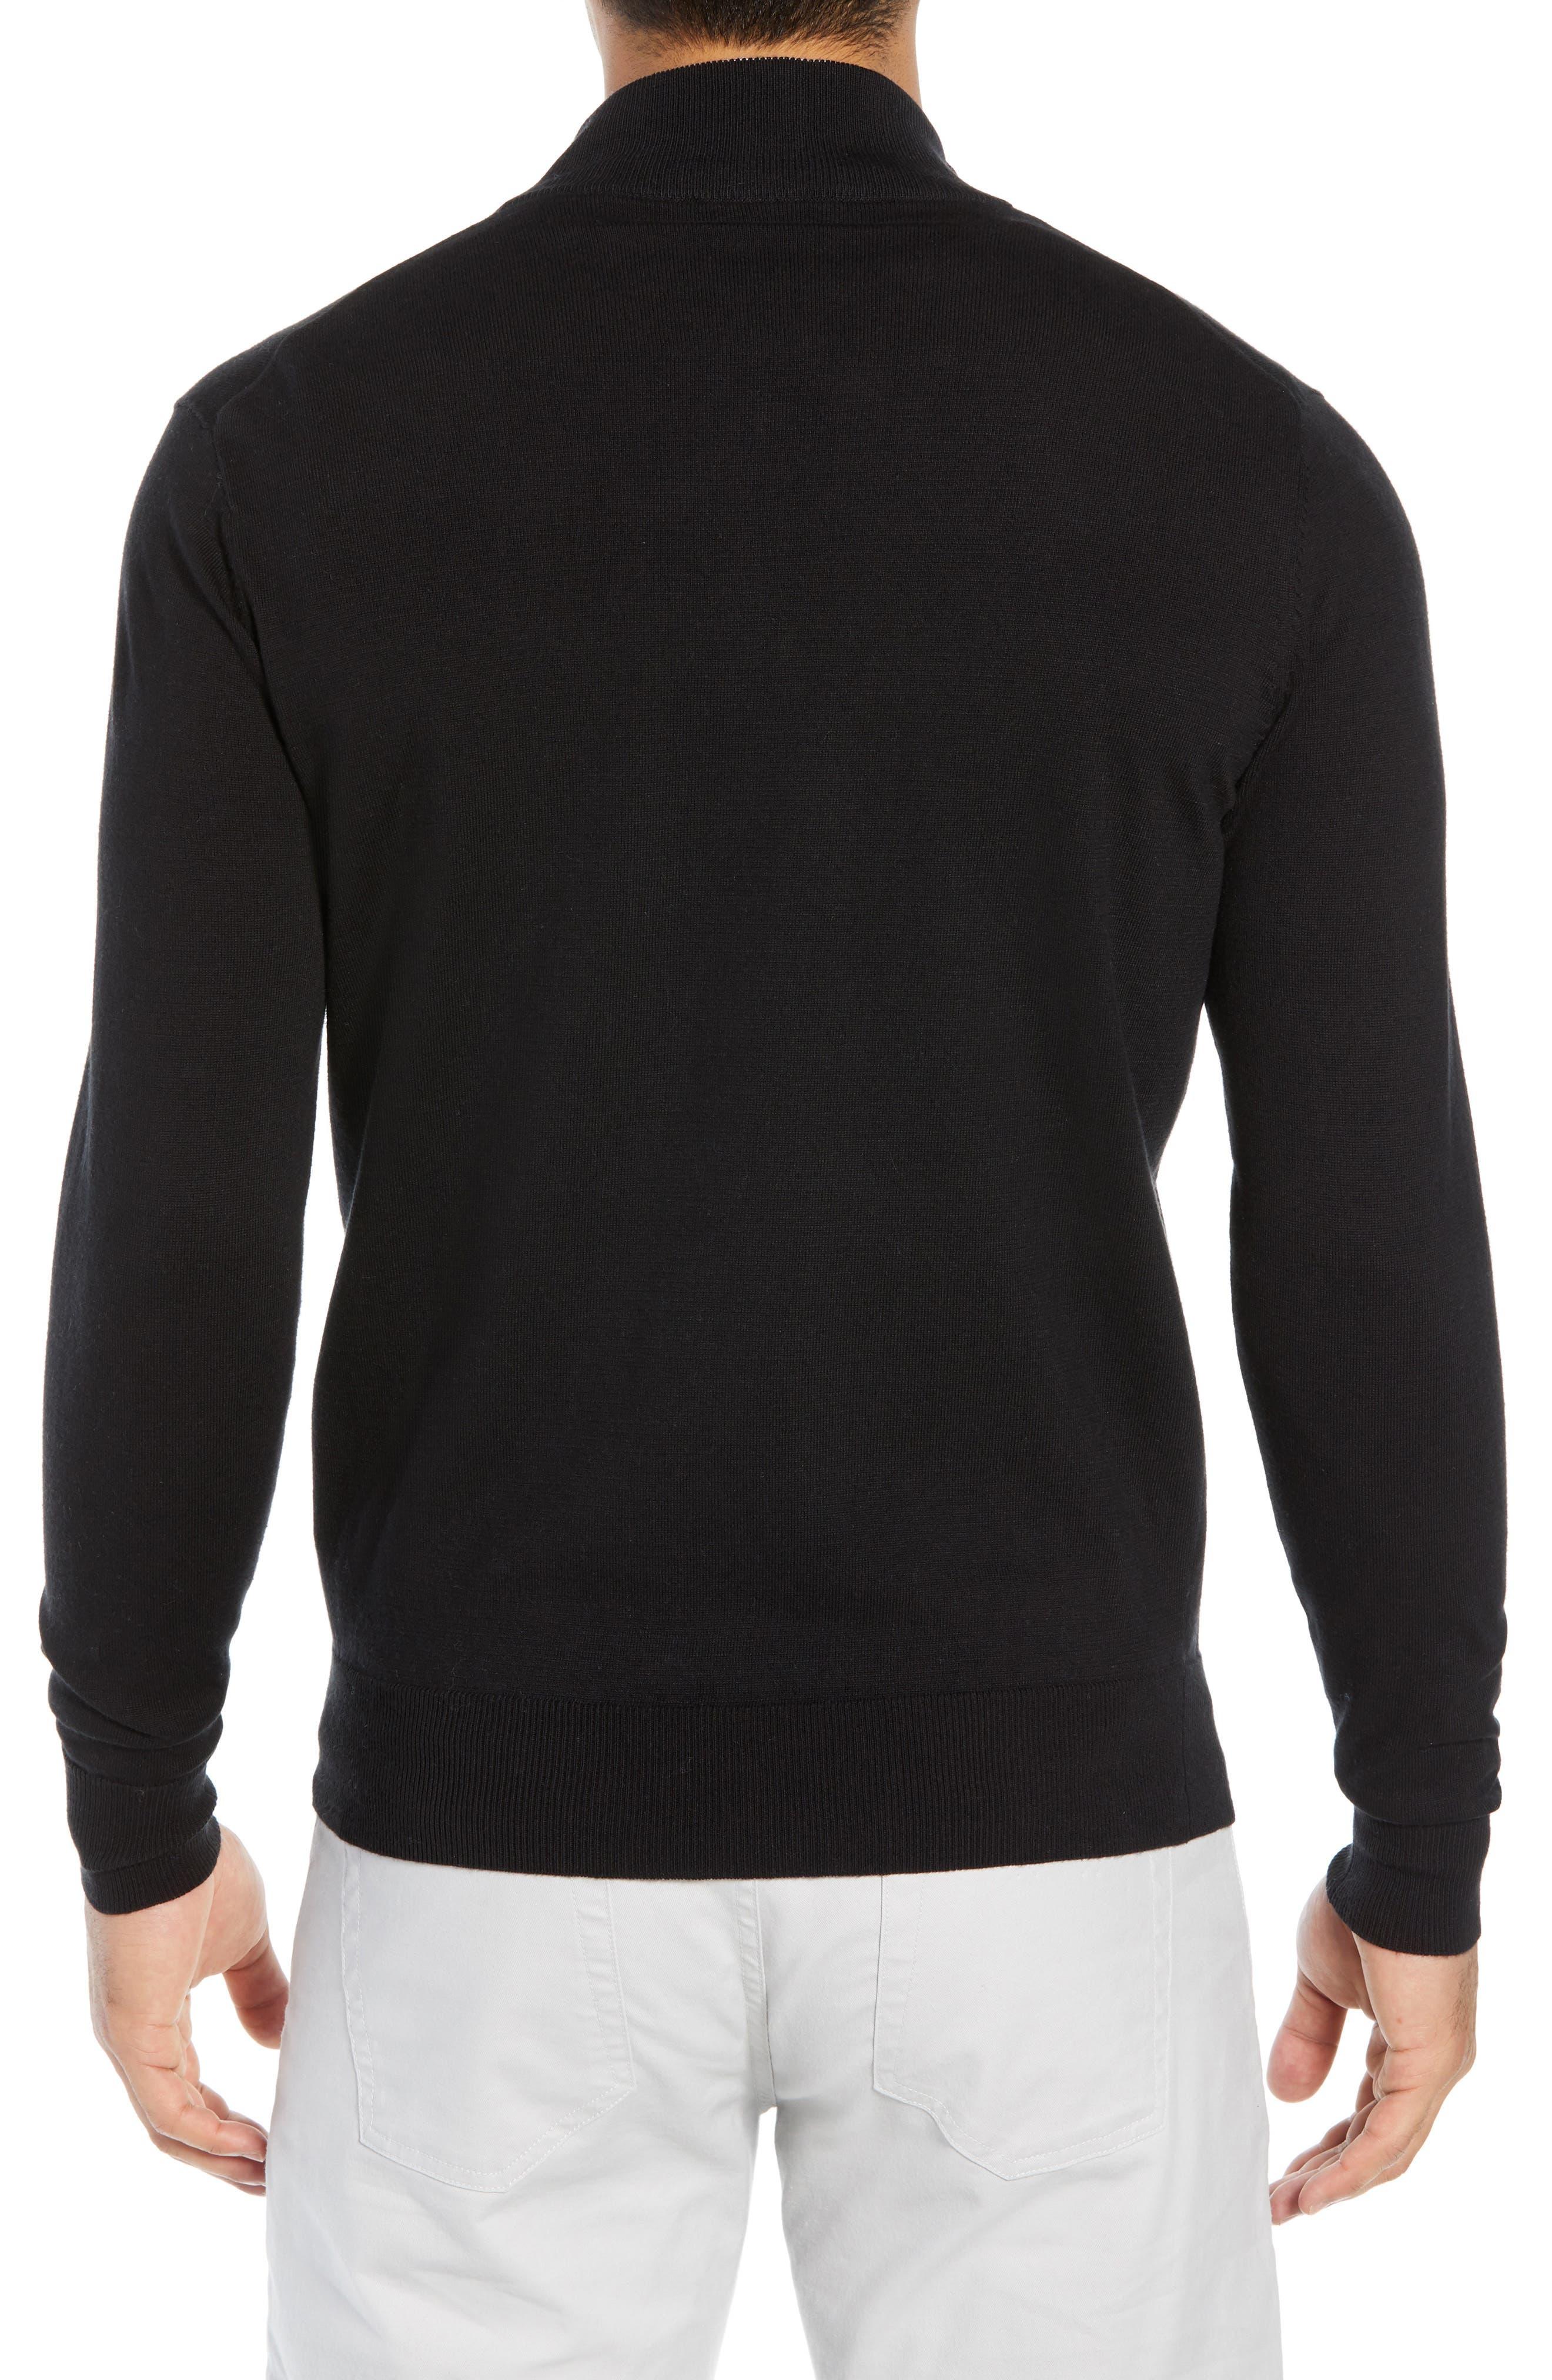 PETER MILLAR,                             Crown Quarter Zip Sweater,                             Alternate thumbnail 2, color,                             BLACK